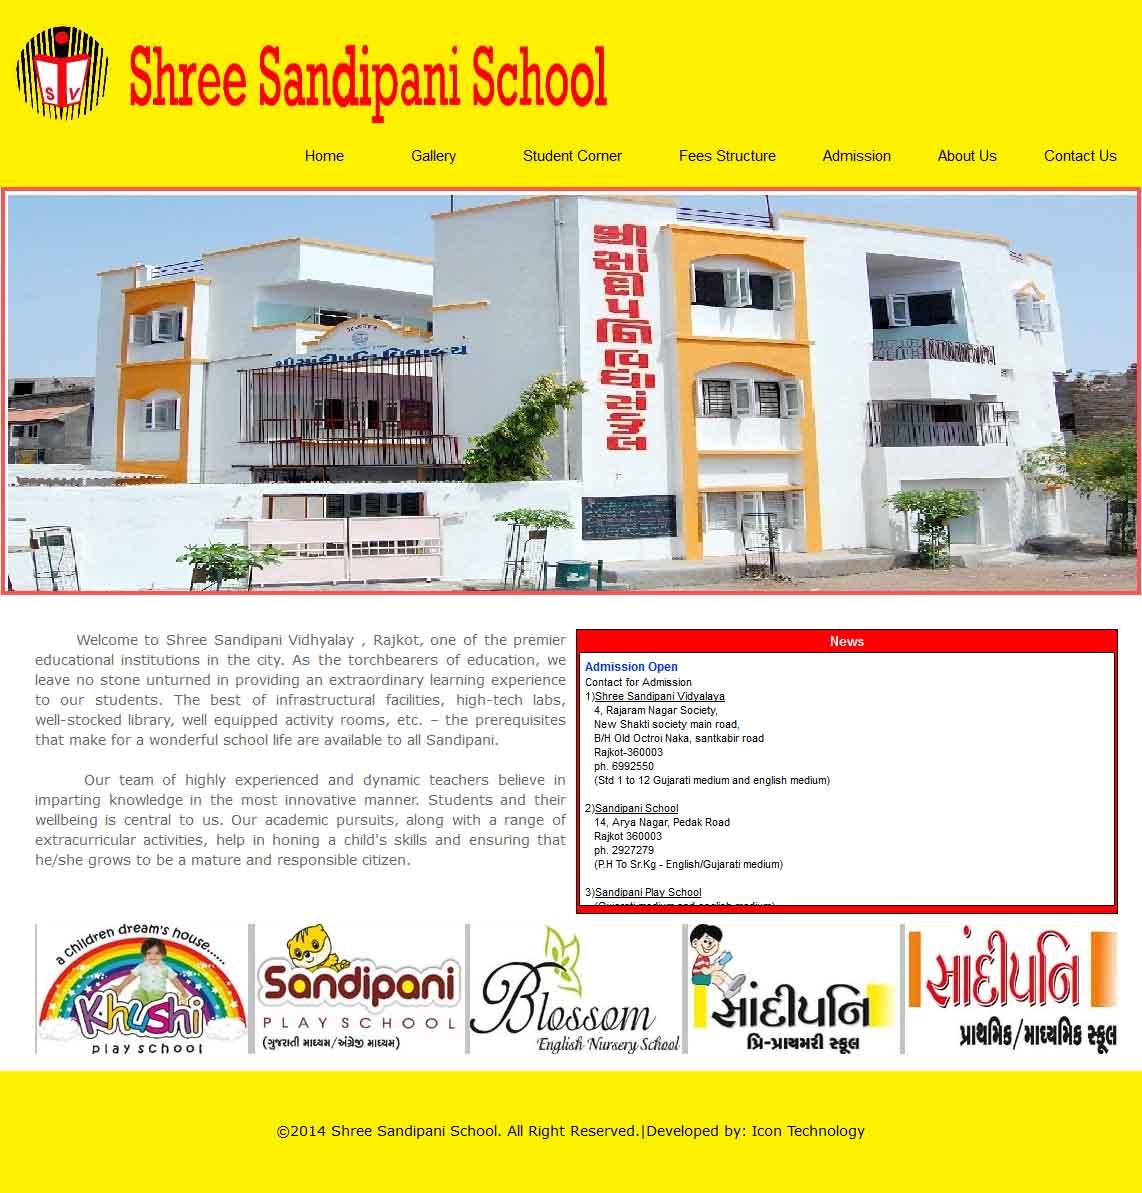 Shree Sandipani School